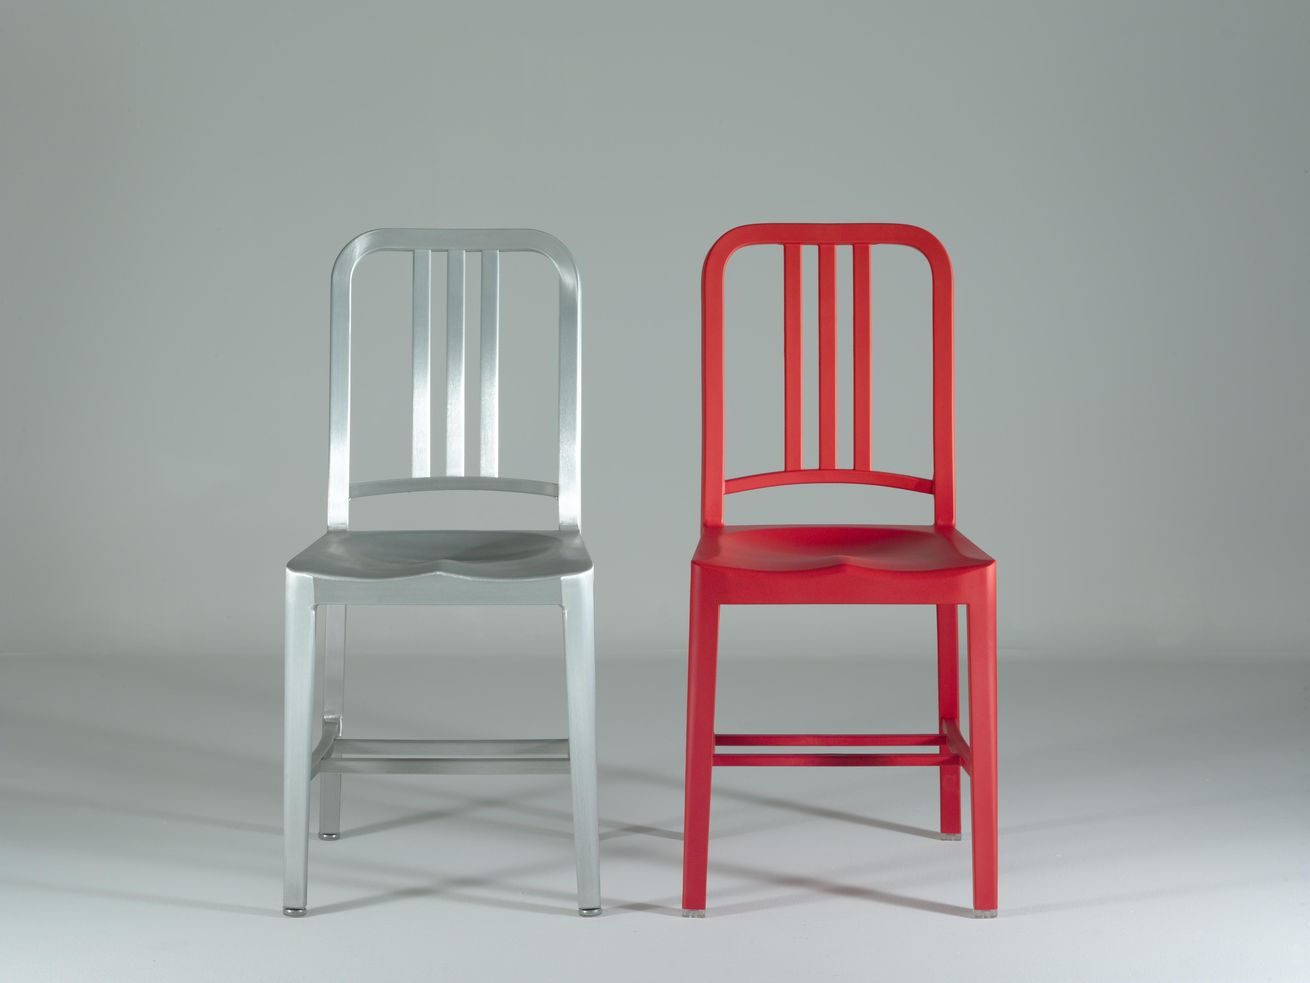 Цельнолитой стул Navy chair